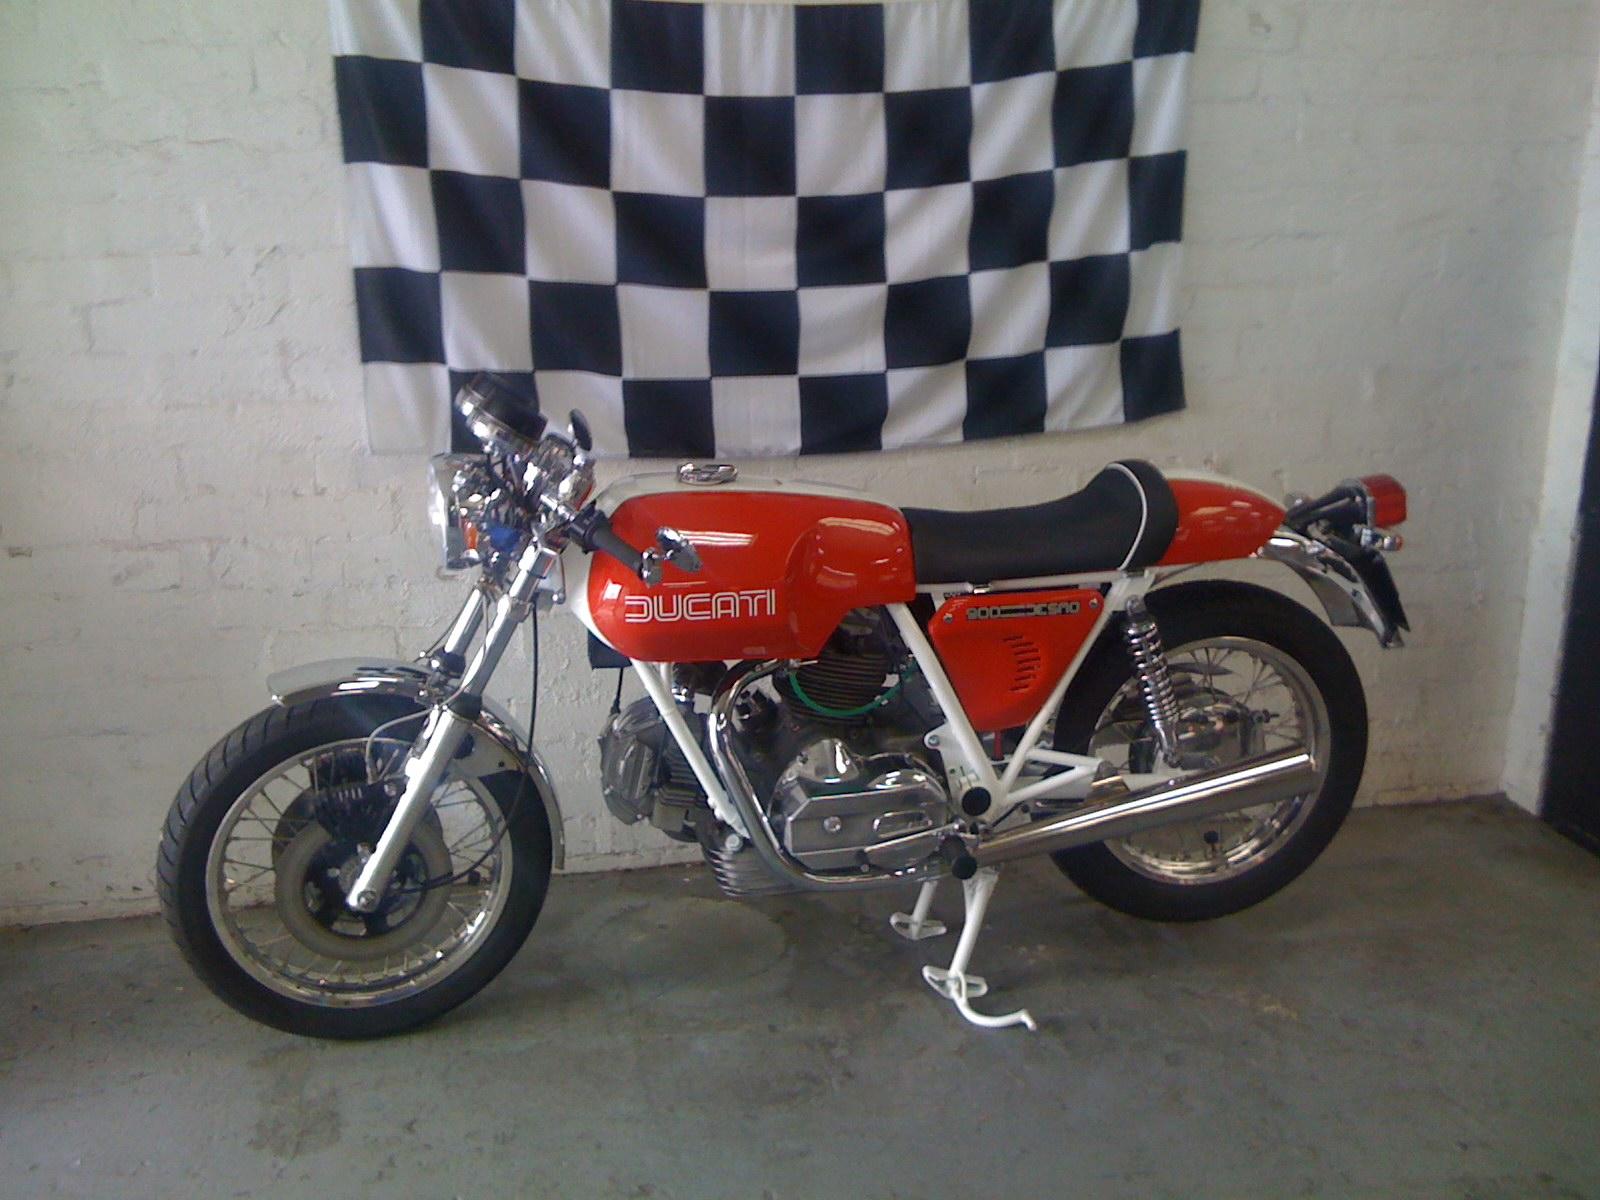 ducati motorbikespecs net motorcycle specification database 860 gt gts image